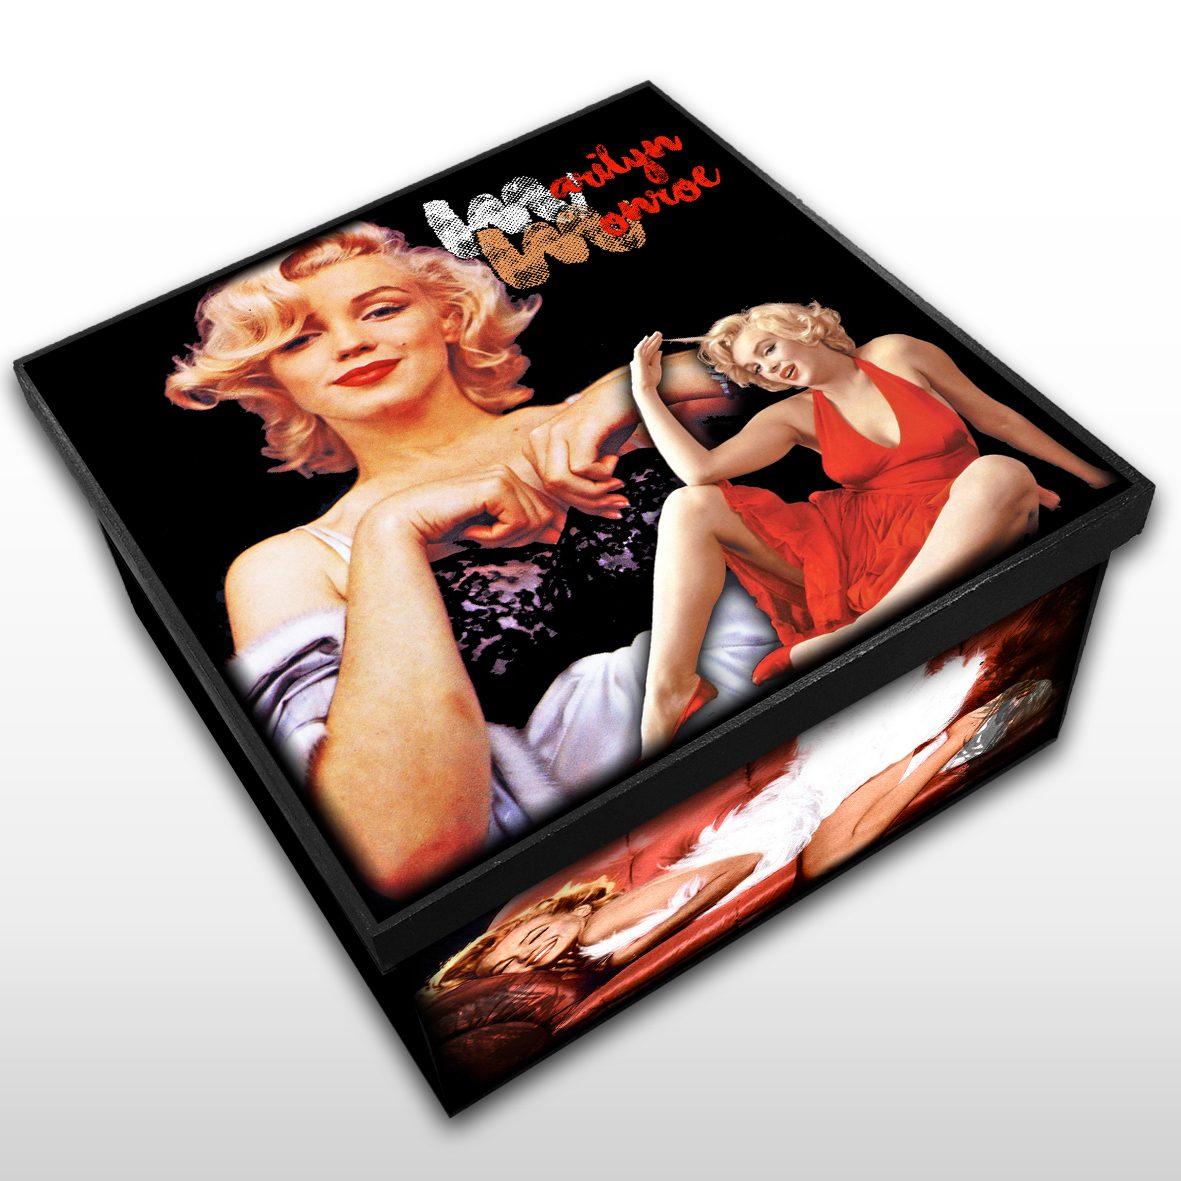 Marilyn Monroe - Caixa em MDF - Tam. Médio - Mr. Rock